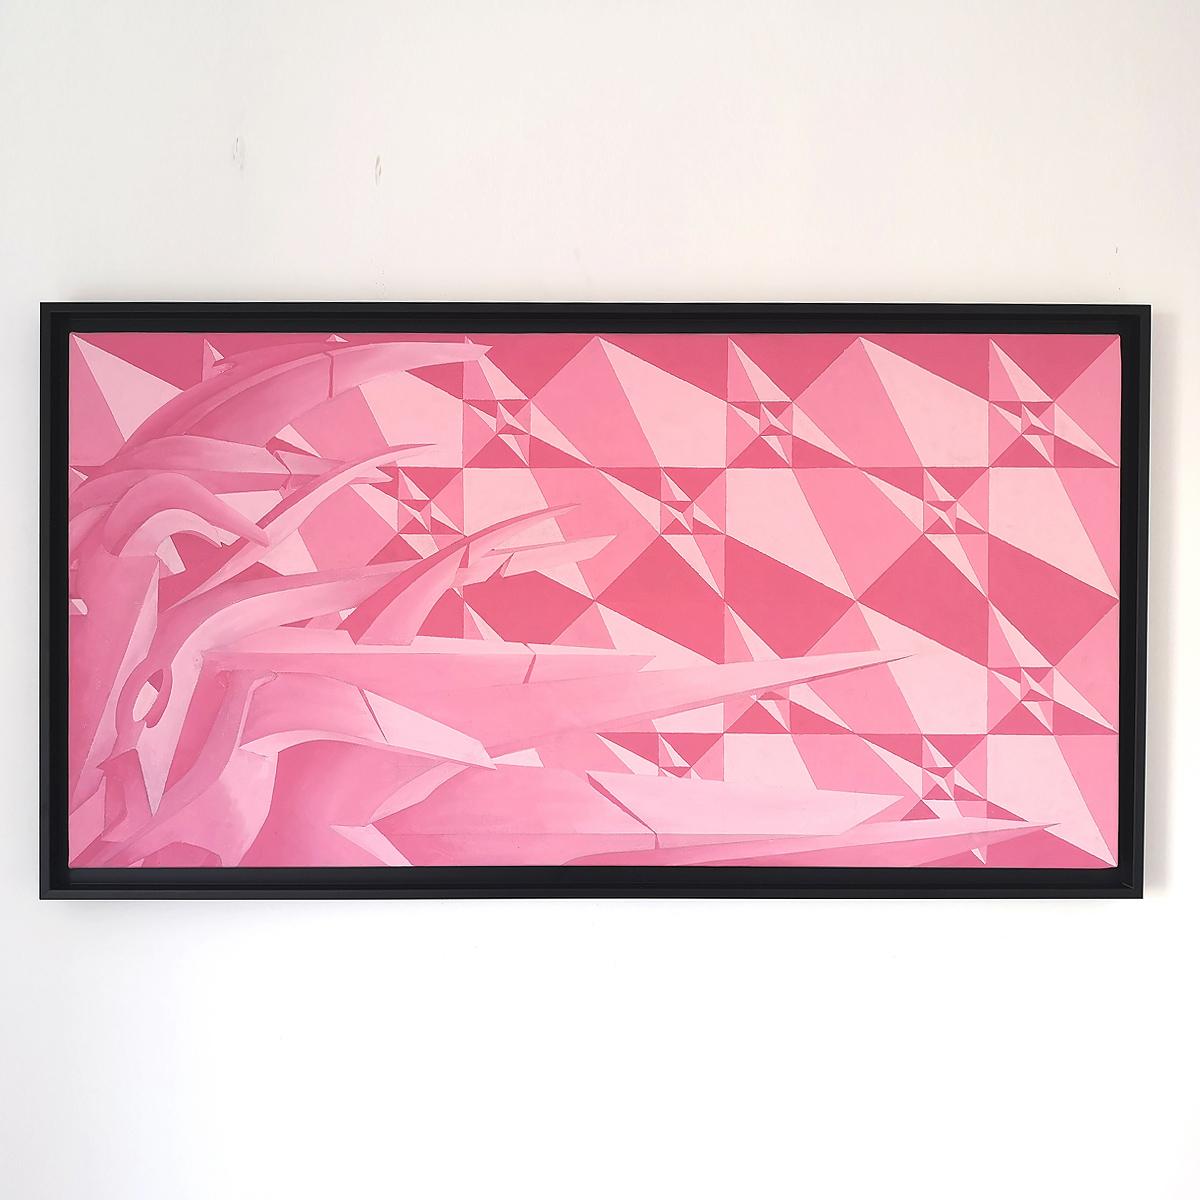 Kotek-Baby-Pink-golden-galerie